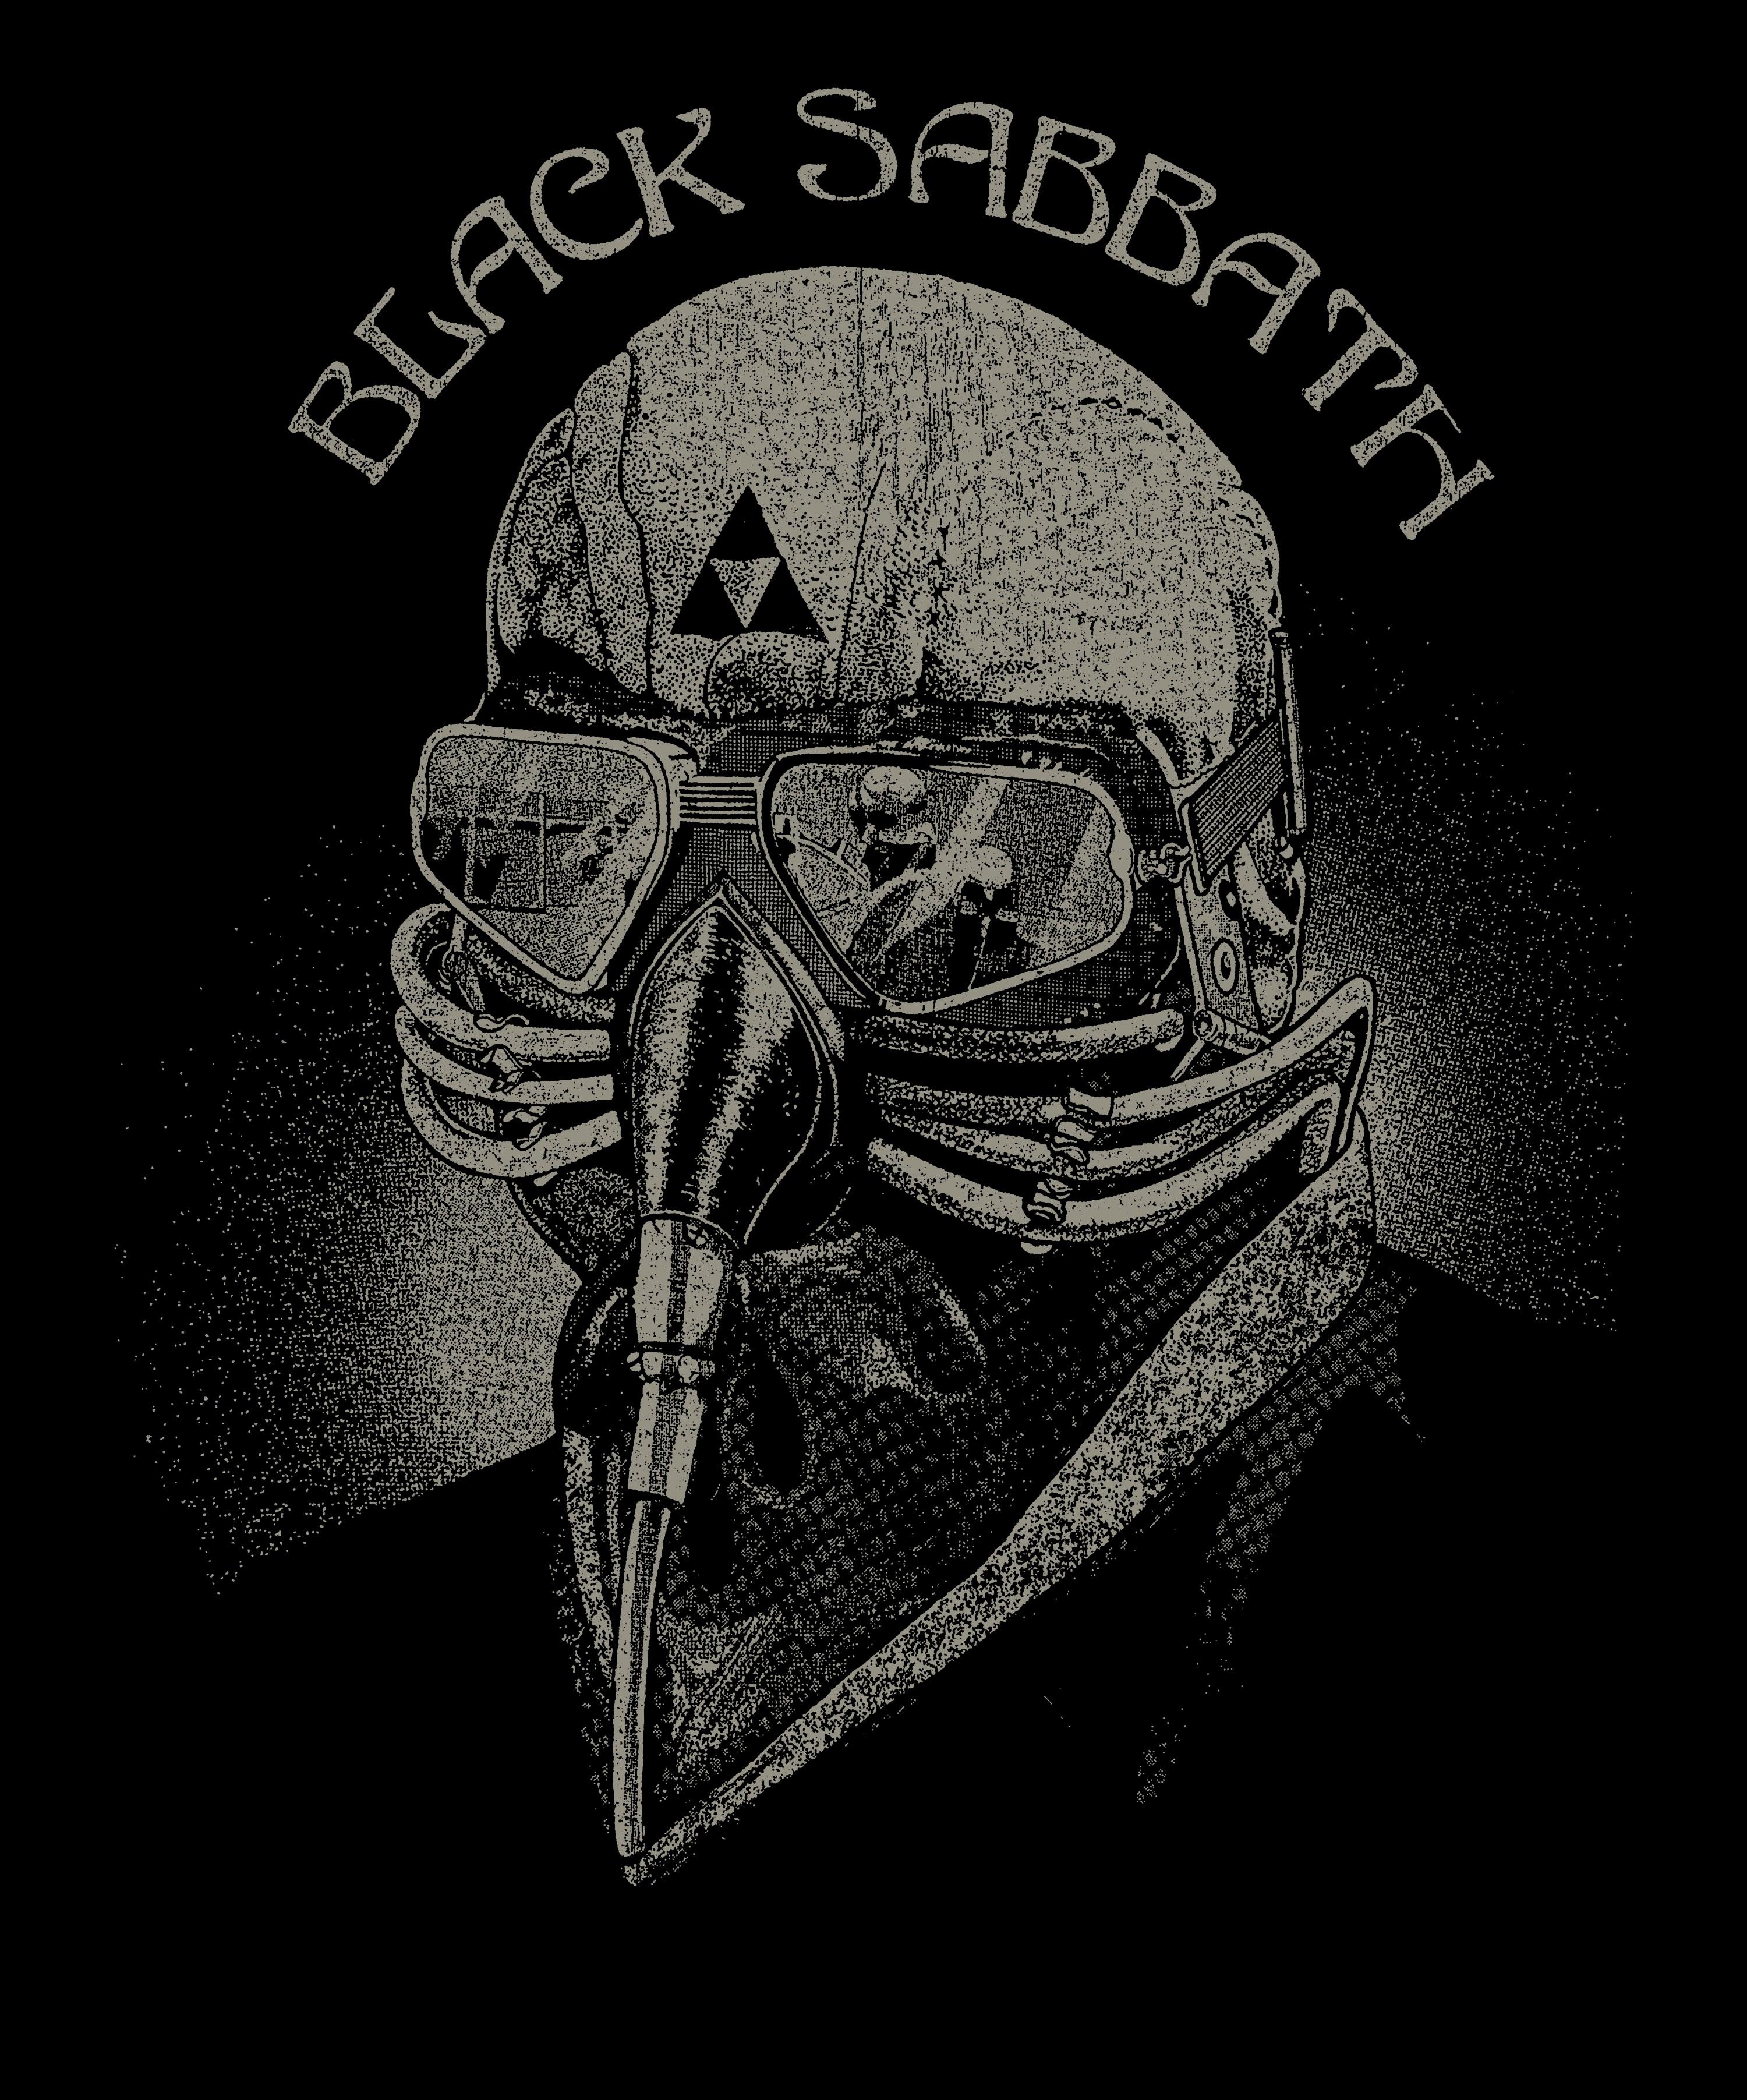 Wallpaper : drawing, illustration, music, Black Sabbath ...